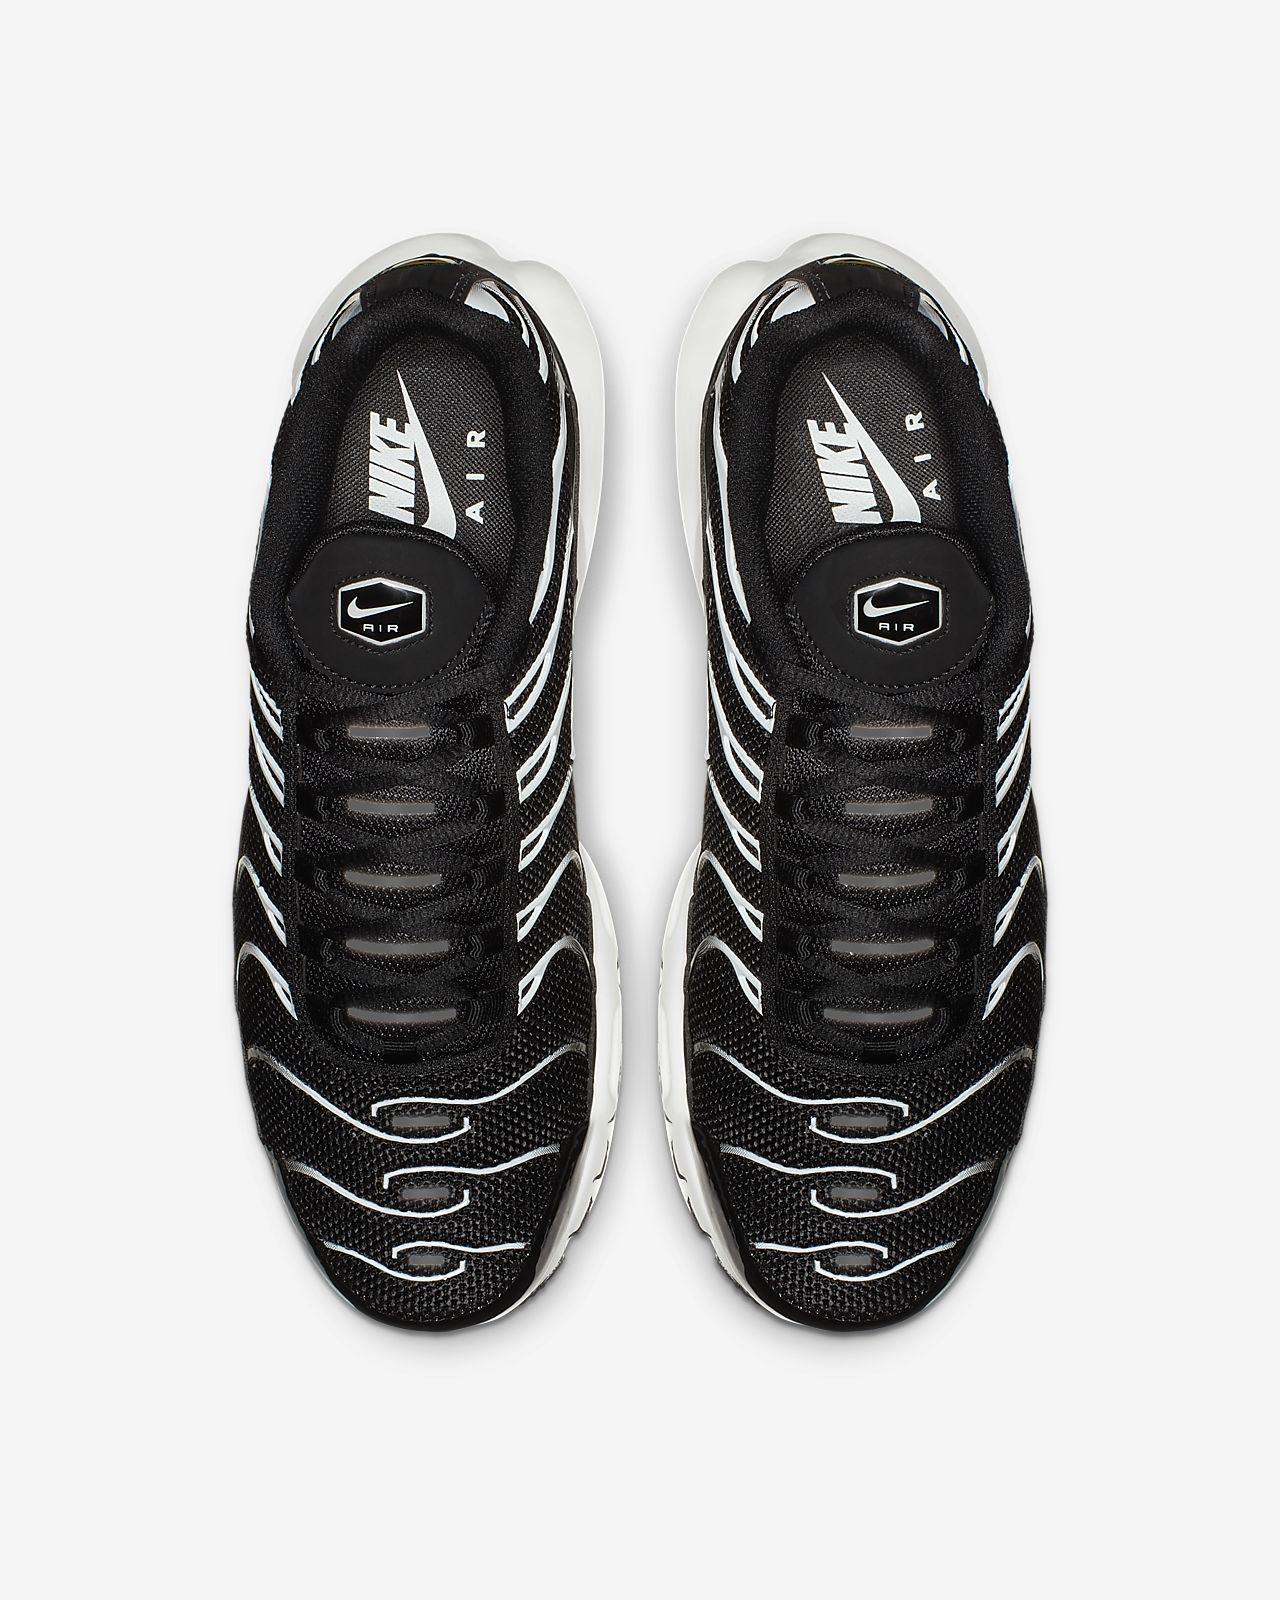 sale retailer 31ce3 441f8 Nike Air Max Plus Men's Shoe